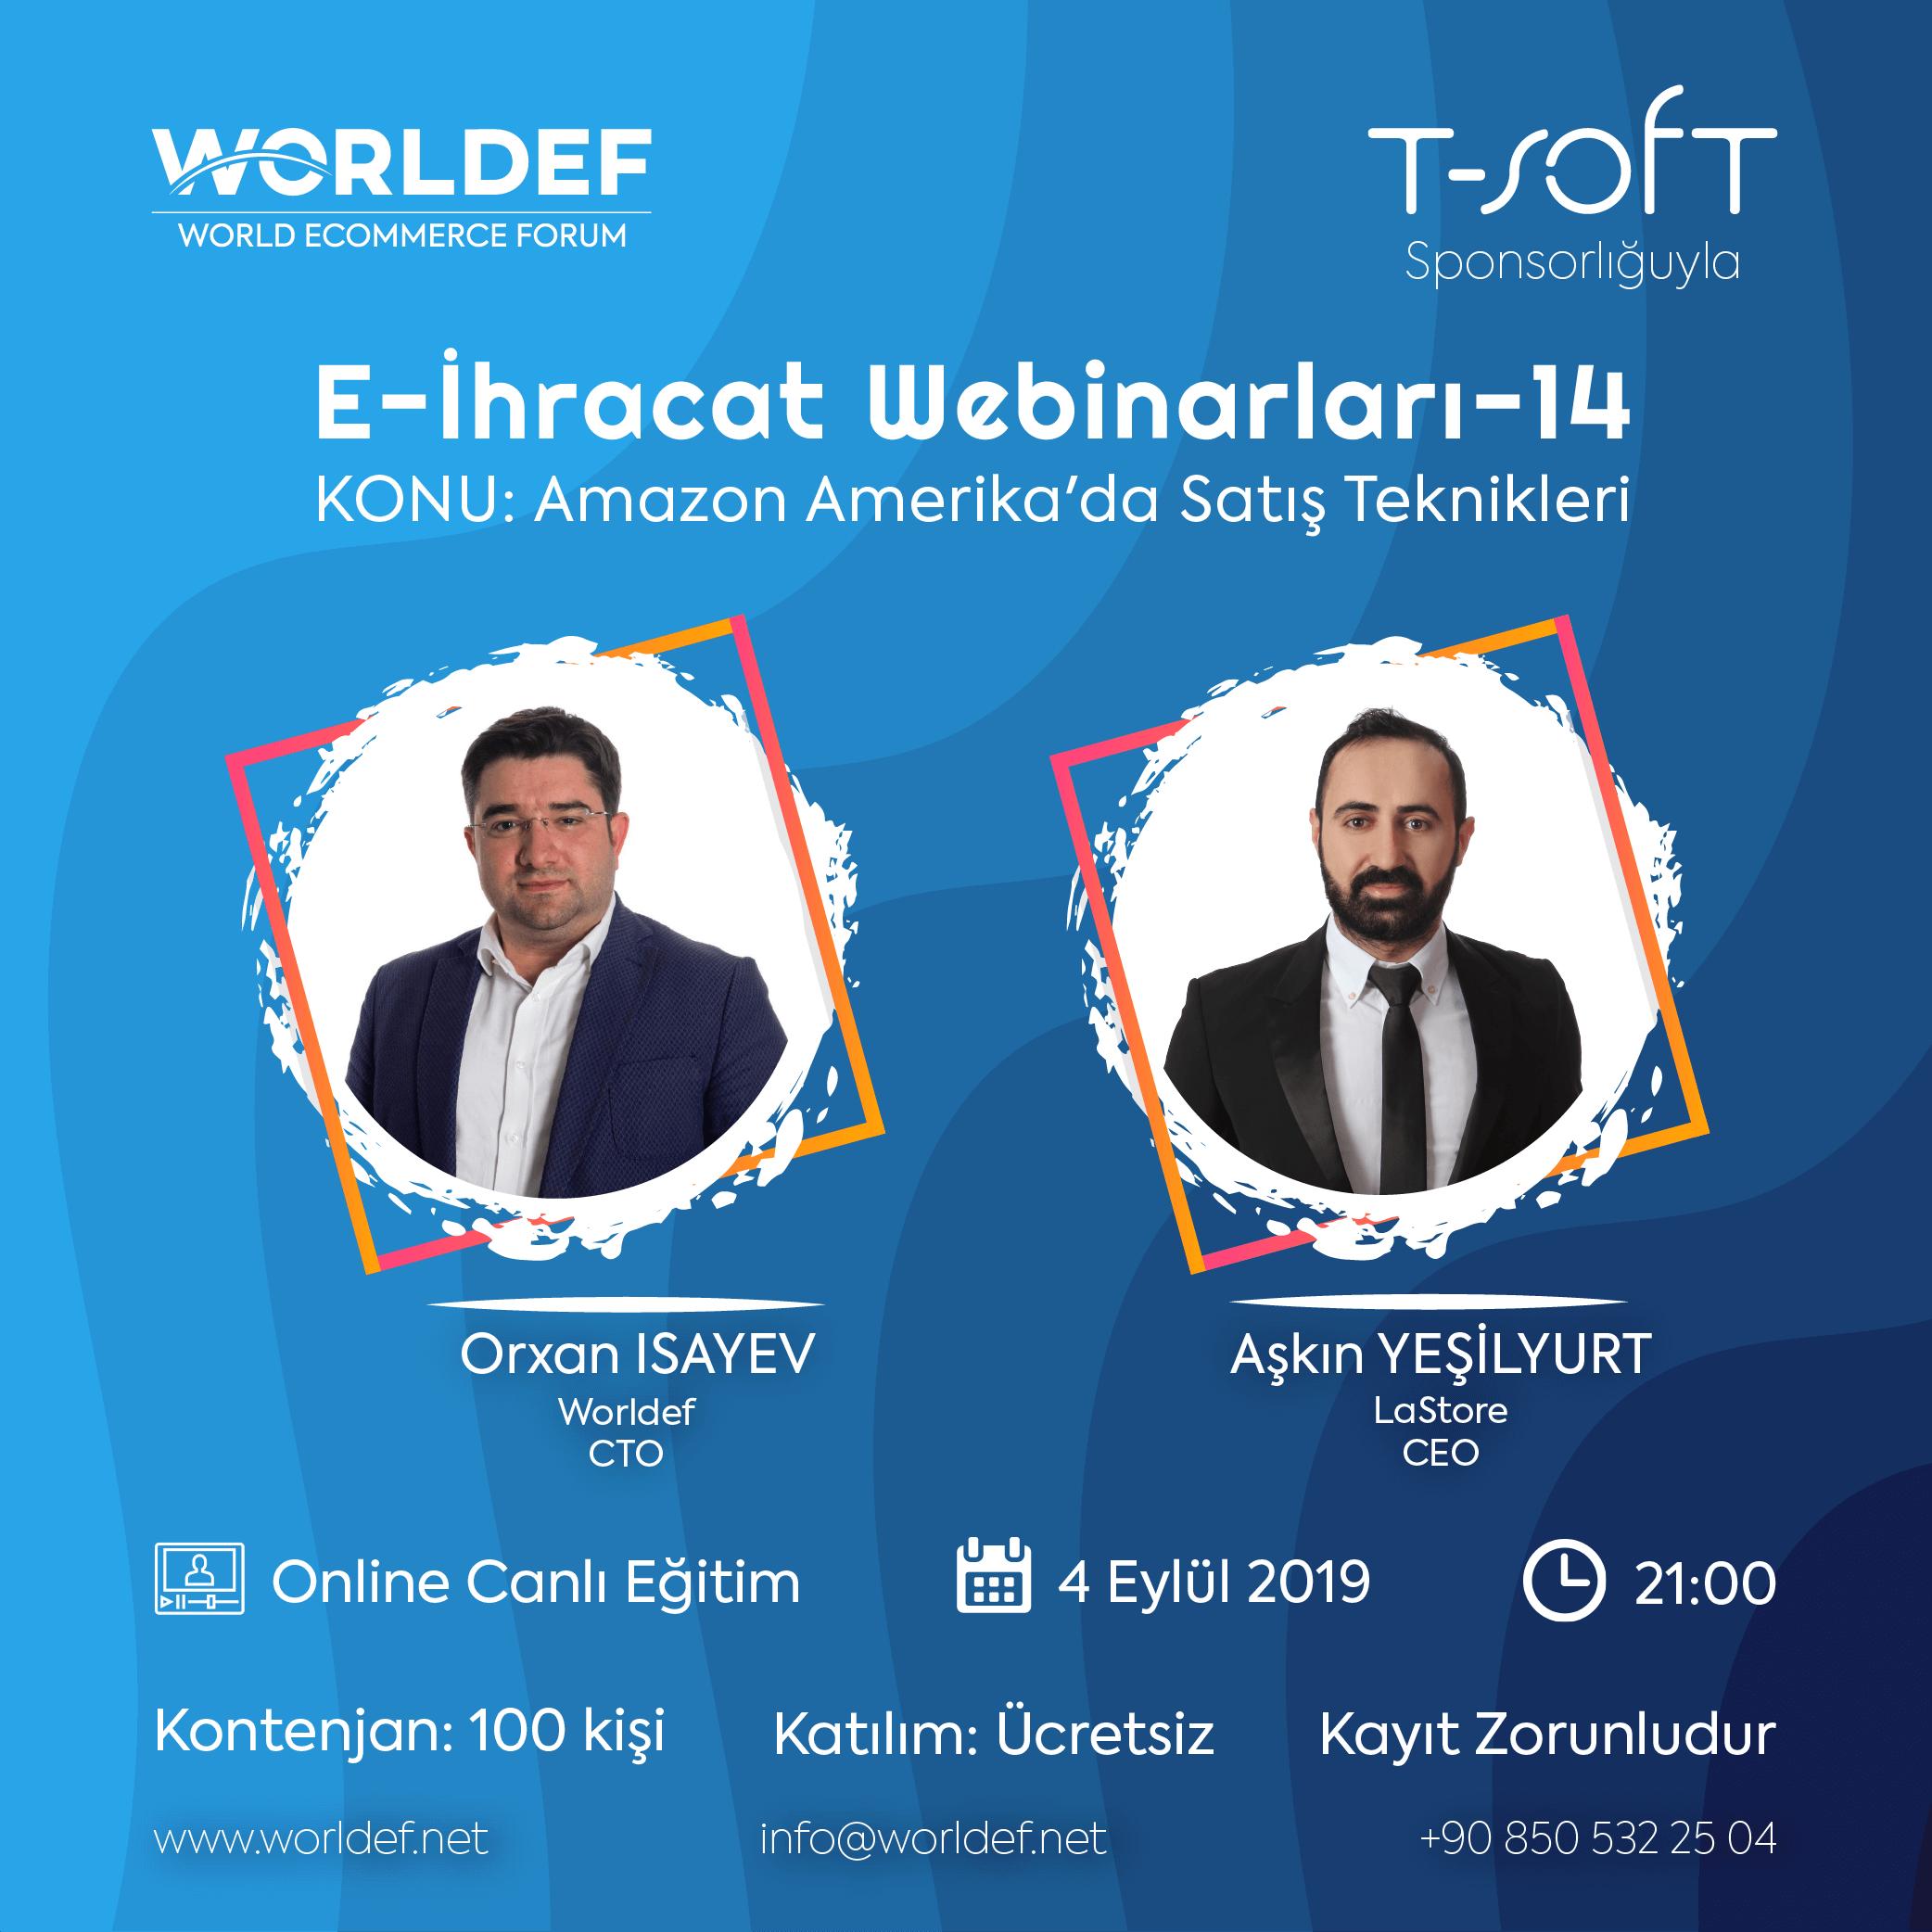 Aşkın Yeşilyurt, CEO of LaStore Group, will be the guest in the cross-border e-commerce webinar series!